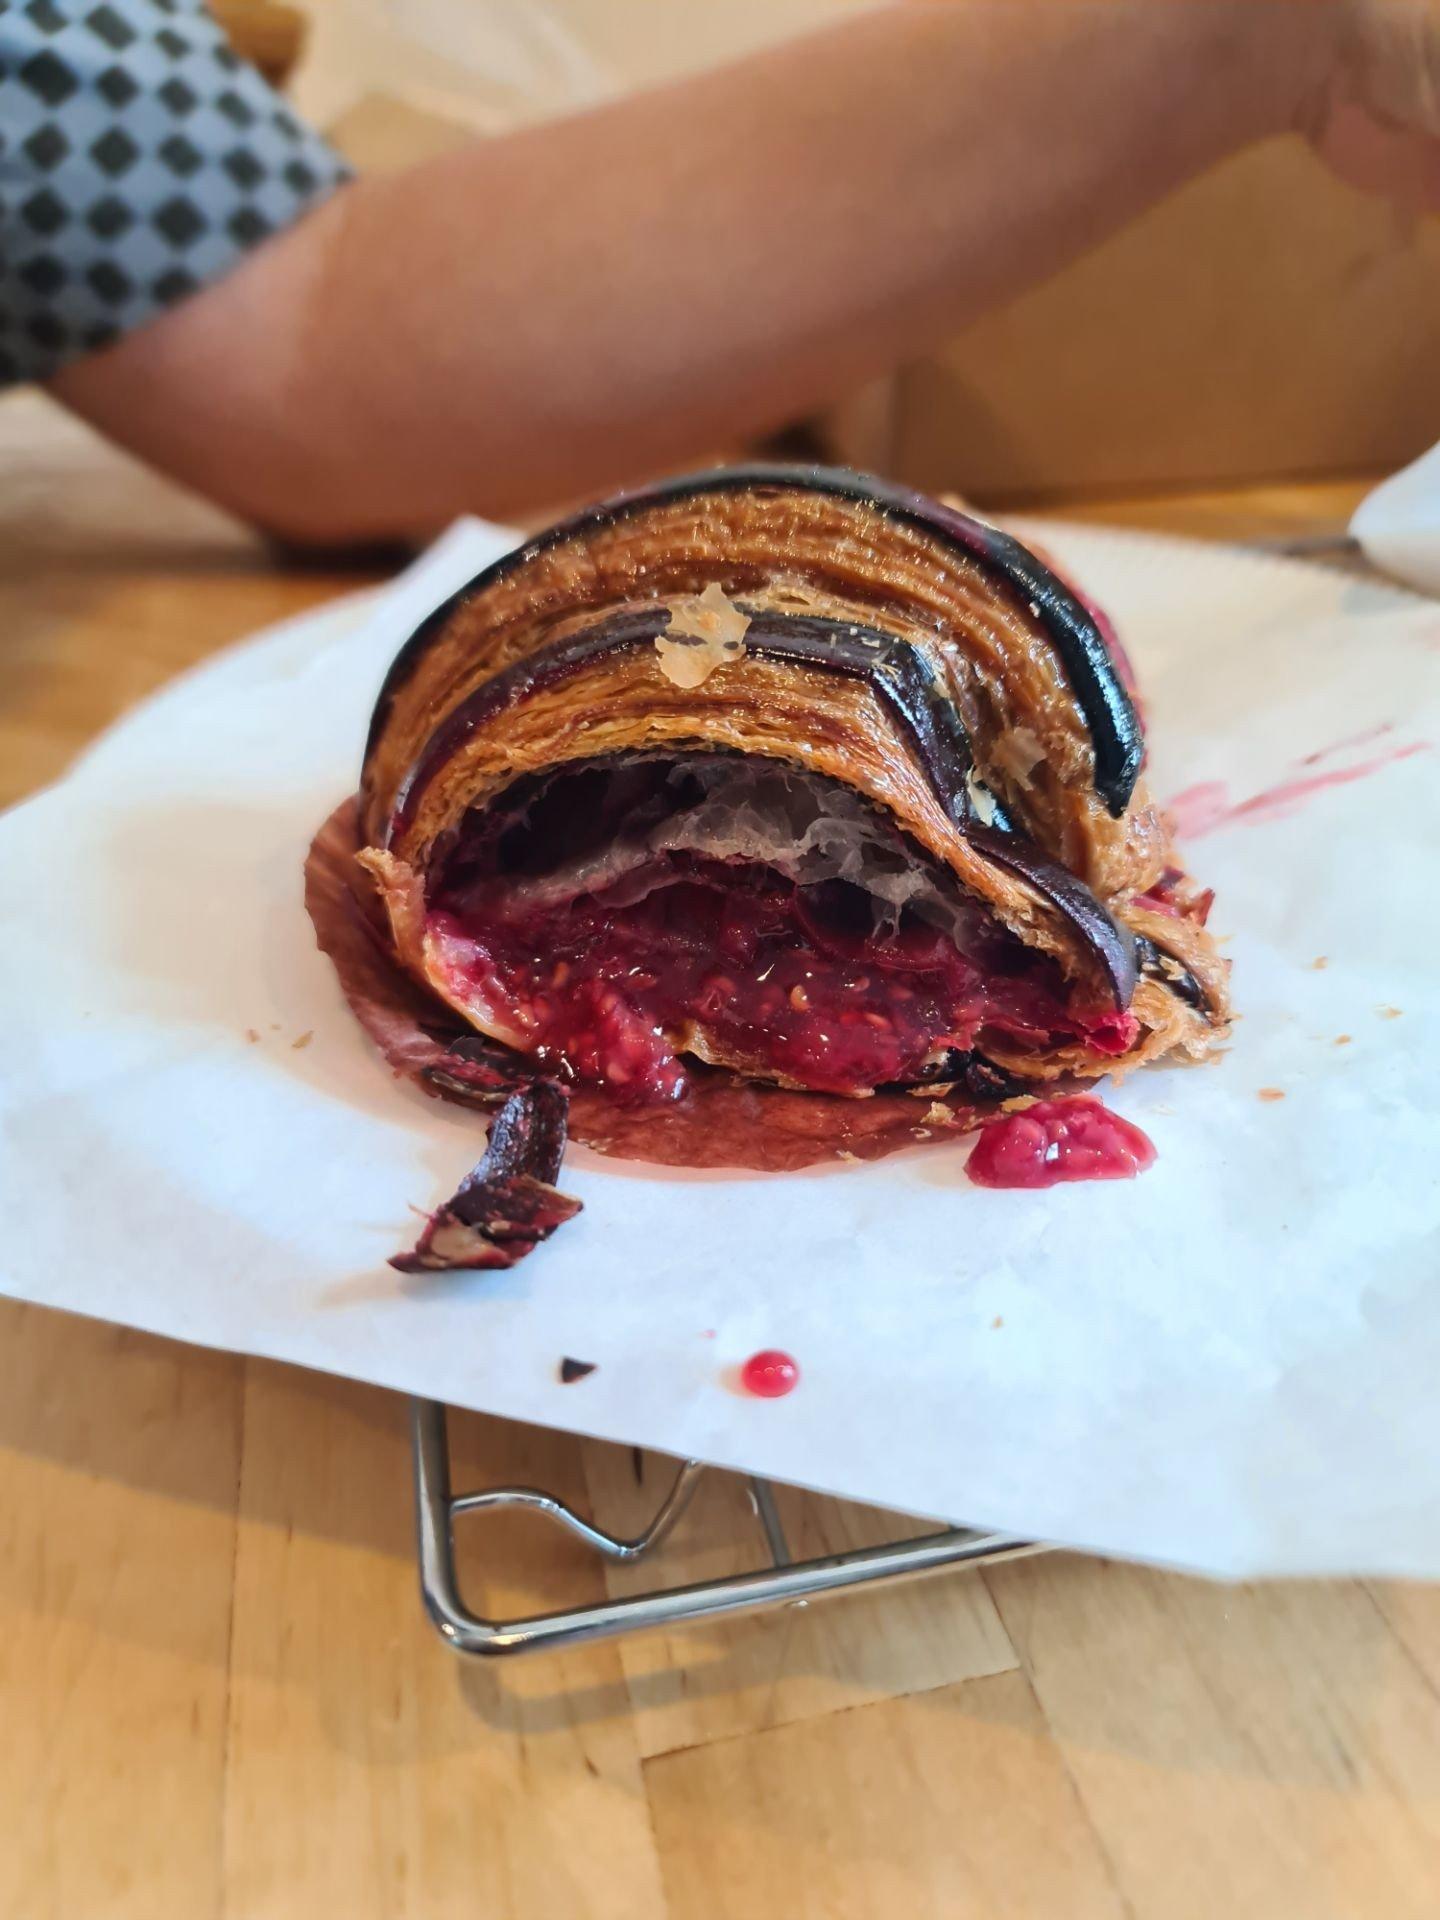 Conkey's Bakery สาขา เอกมัย 22